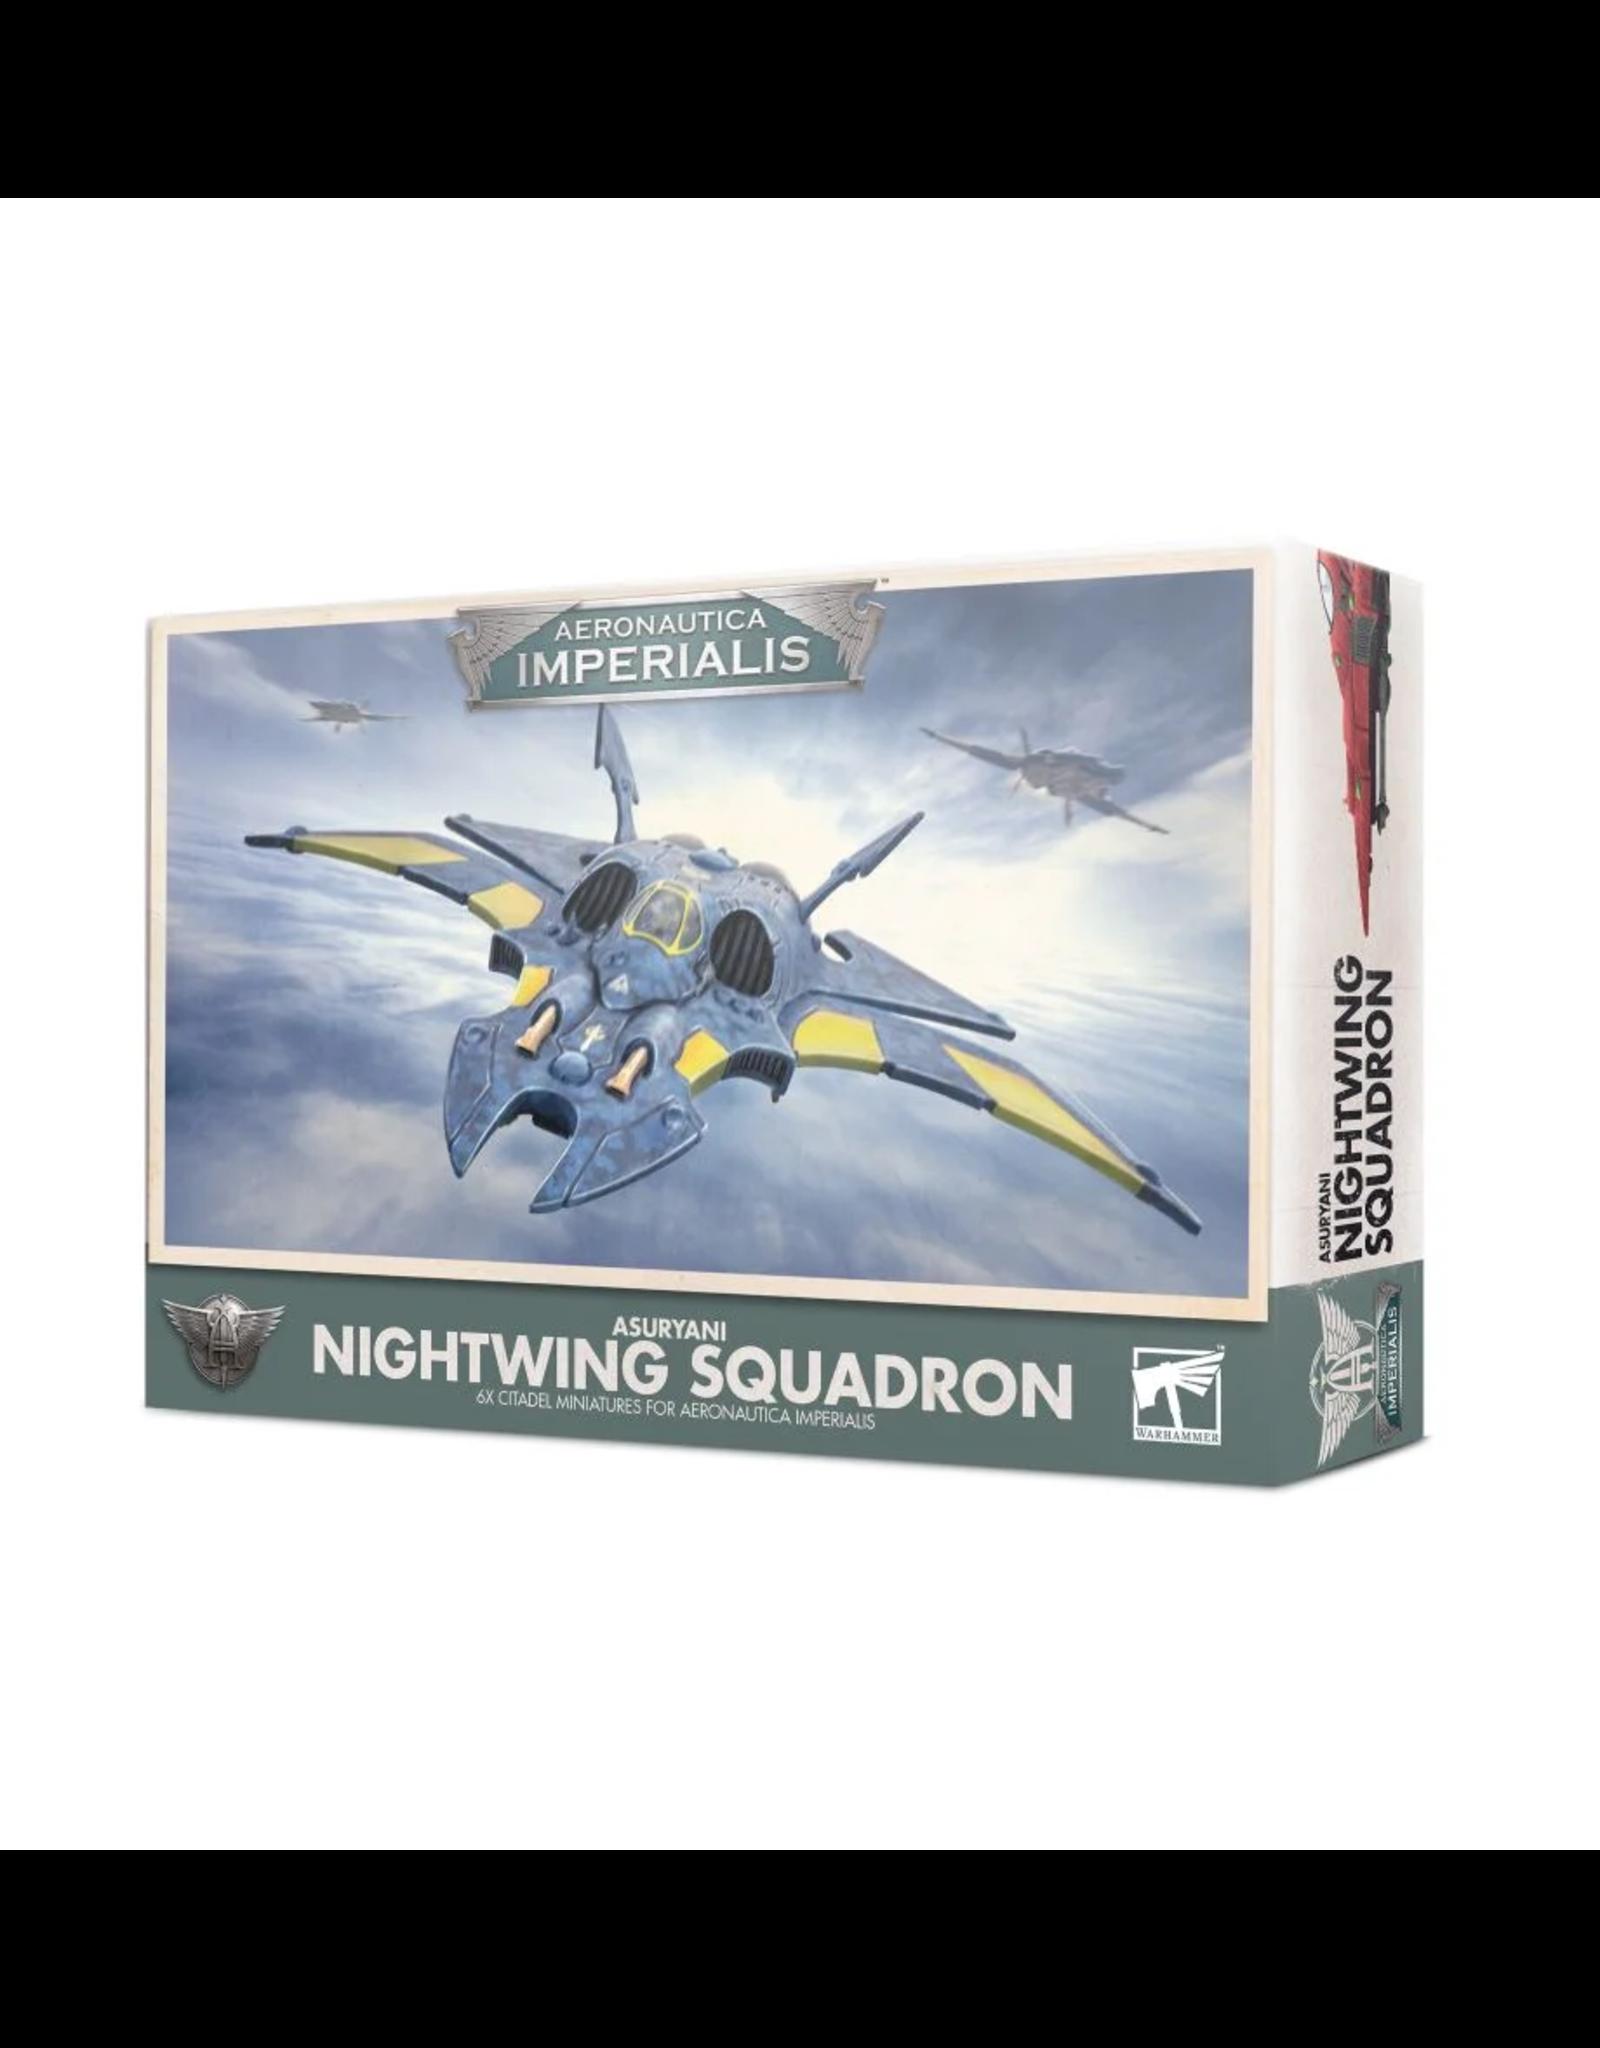 Games Workshop Aeronautica Imperialis: Asuryani Nightwing Squadron